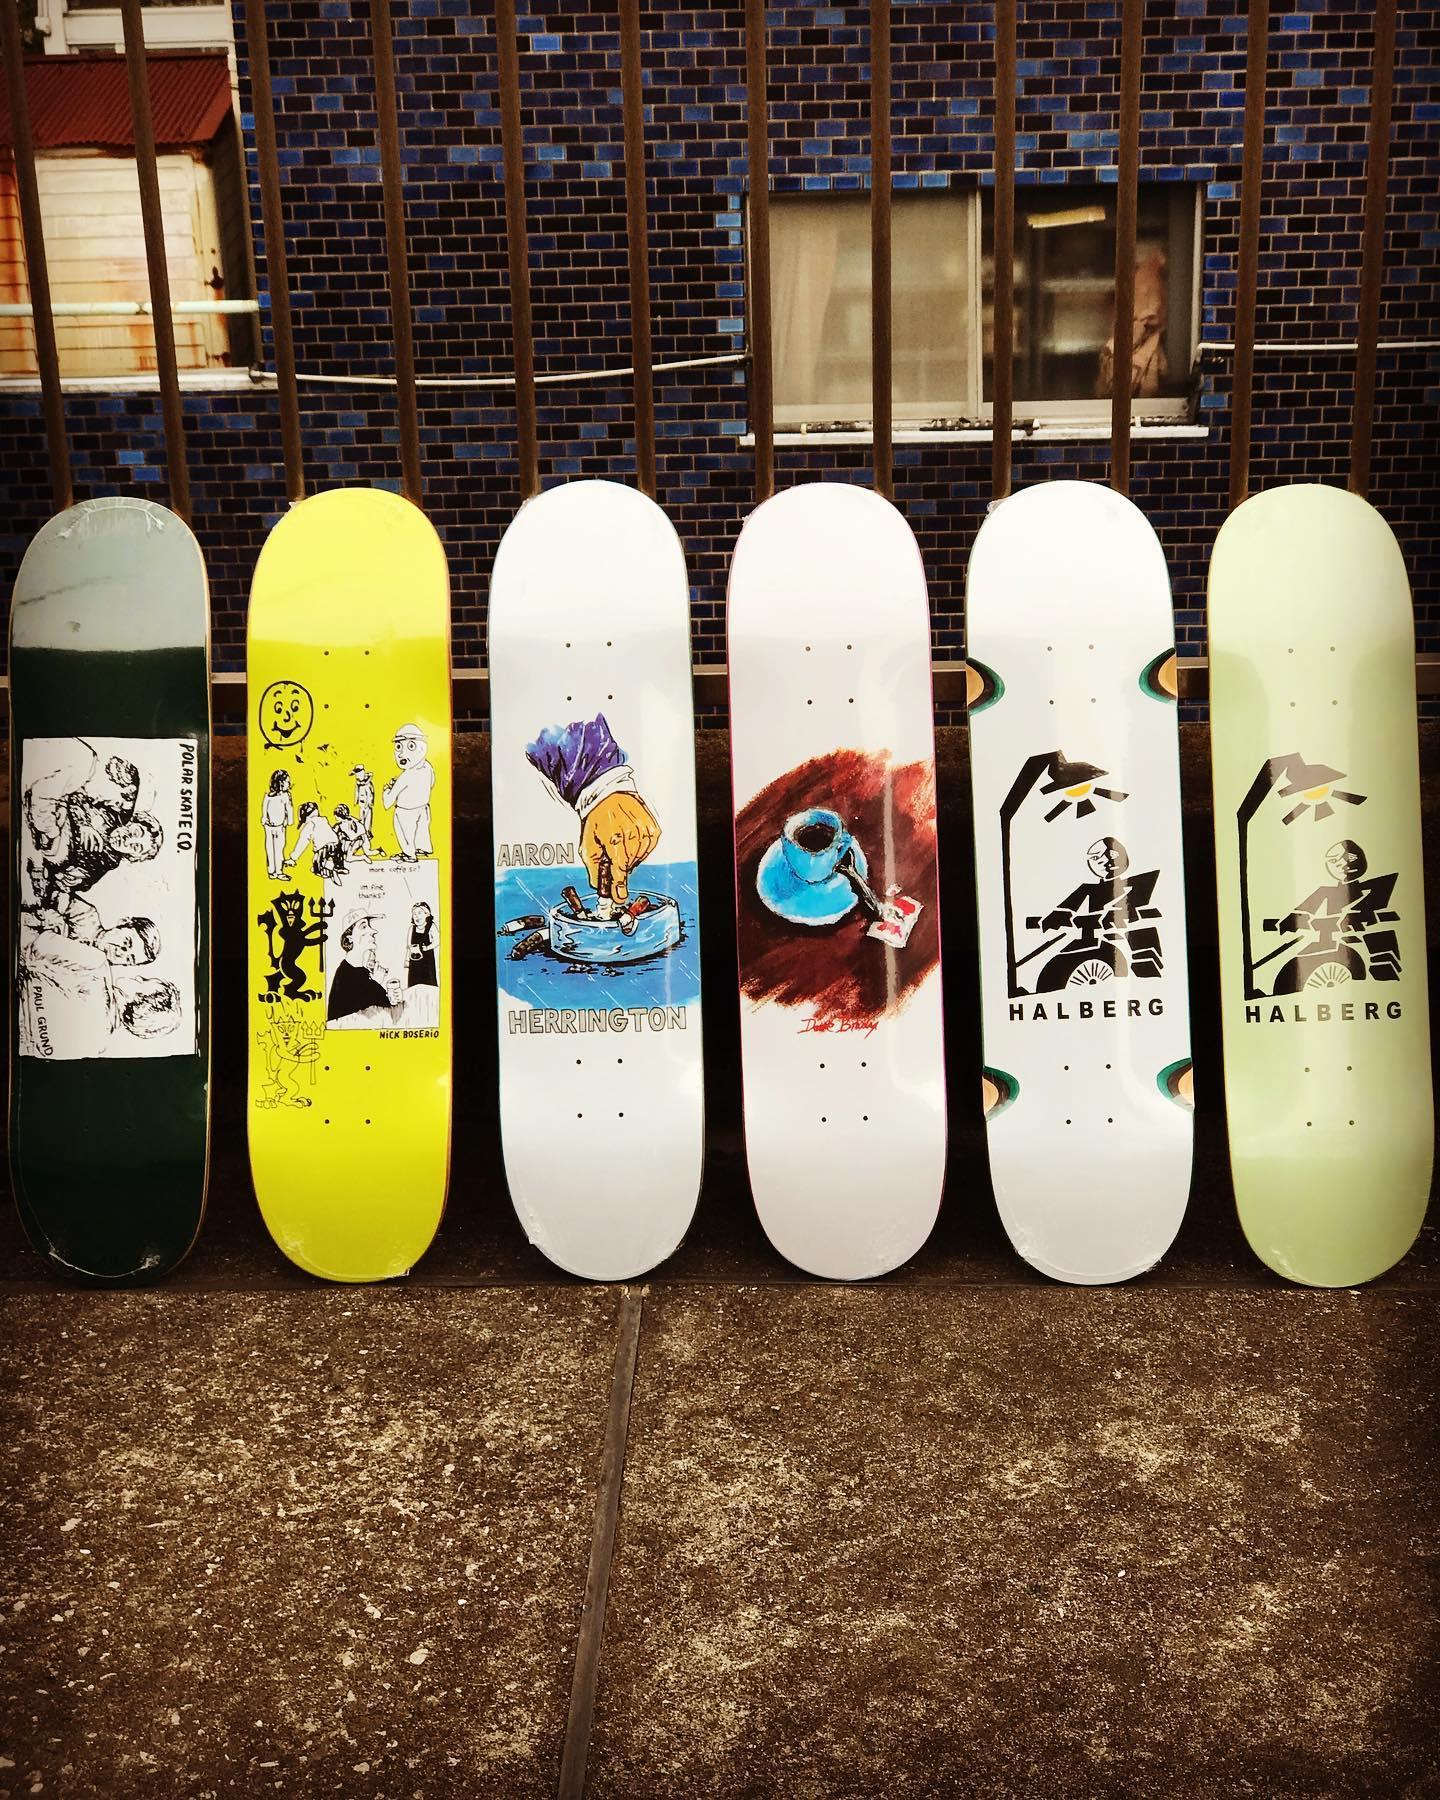 ・New @polarskateco decks.Pontus Alv手掛けるスウェーデン発スケートカンパニー「POLAR SKATE CO./ポーラー」。Pontus自身、プロスケーターとしてのみならず映像作家やアーティストとして幅広く活動しそれらの培った経験をデッキに落とし込んだ世界的評価を集めるスケートカンパニーです。